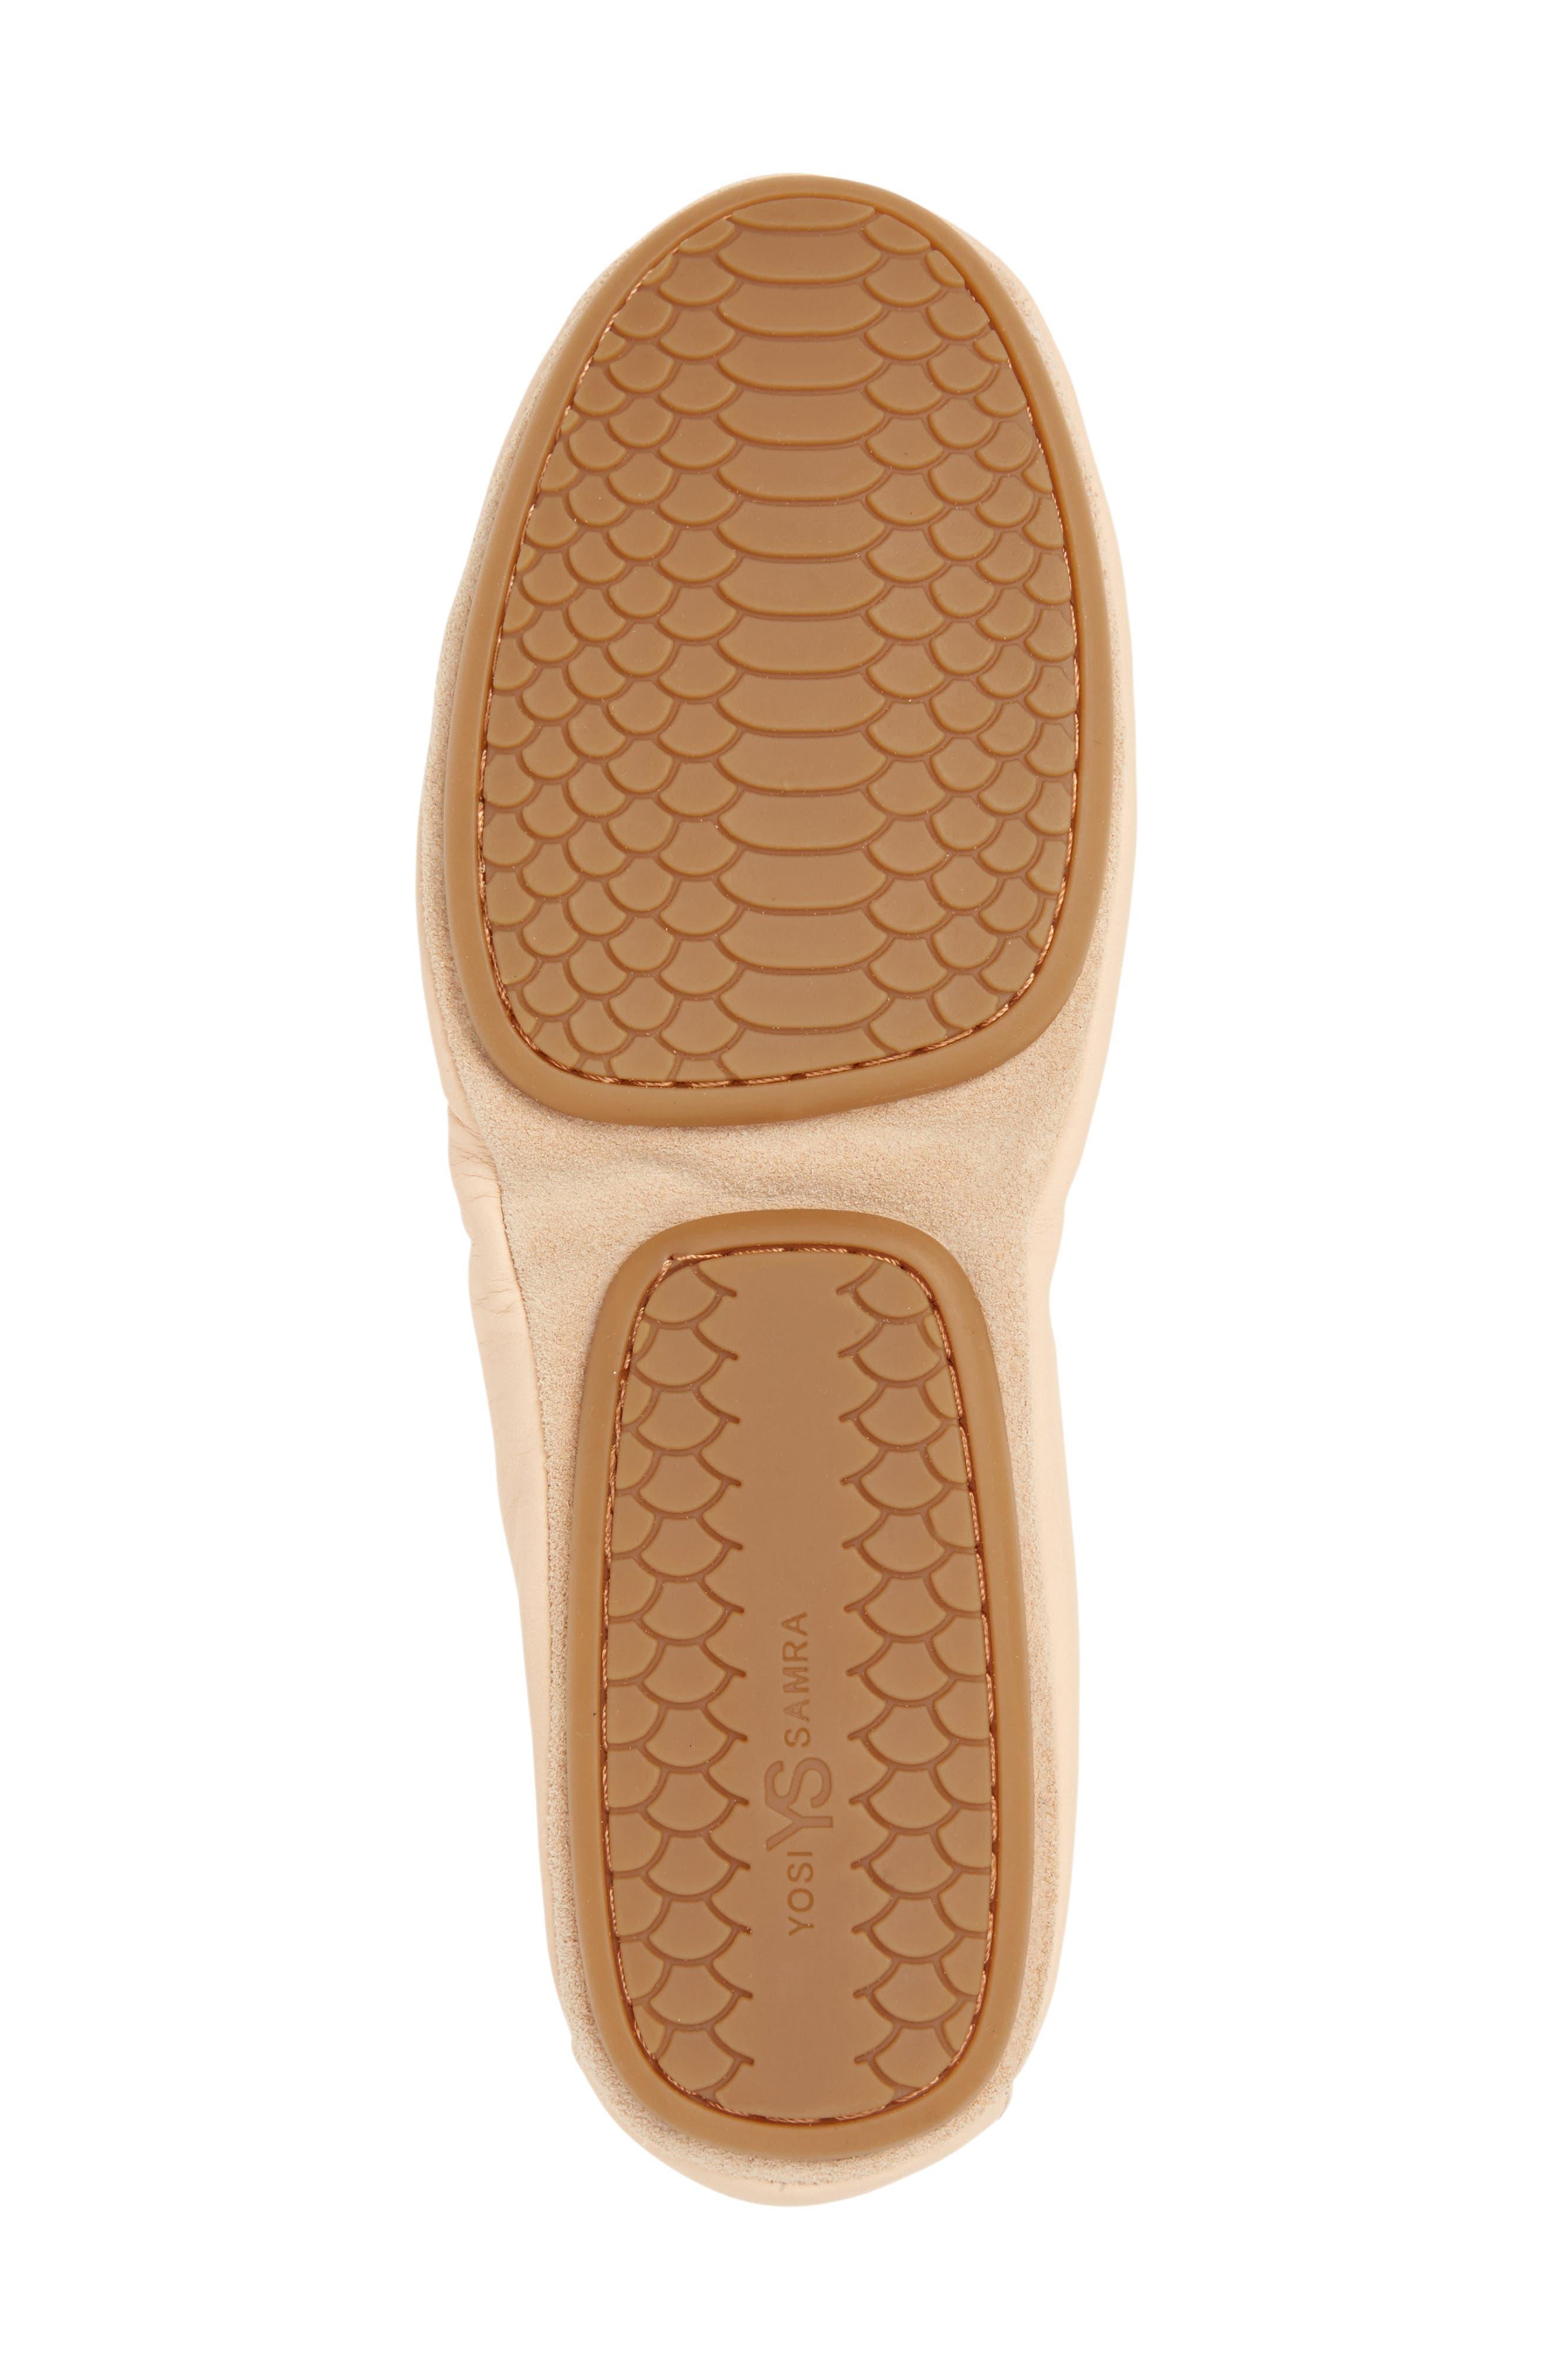 Samara Foldable Ballet Flat,                             Alternate thumbnail 6, color,                             Nude Leather